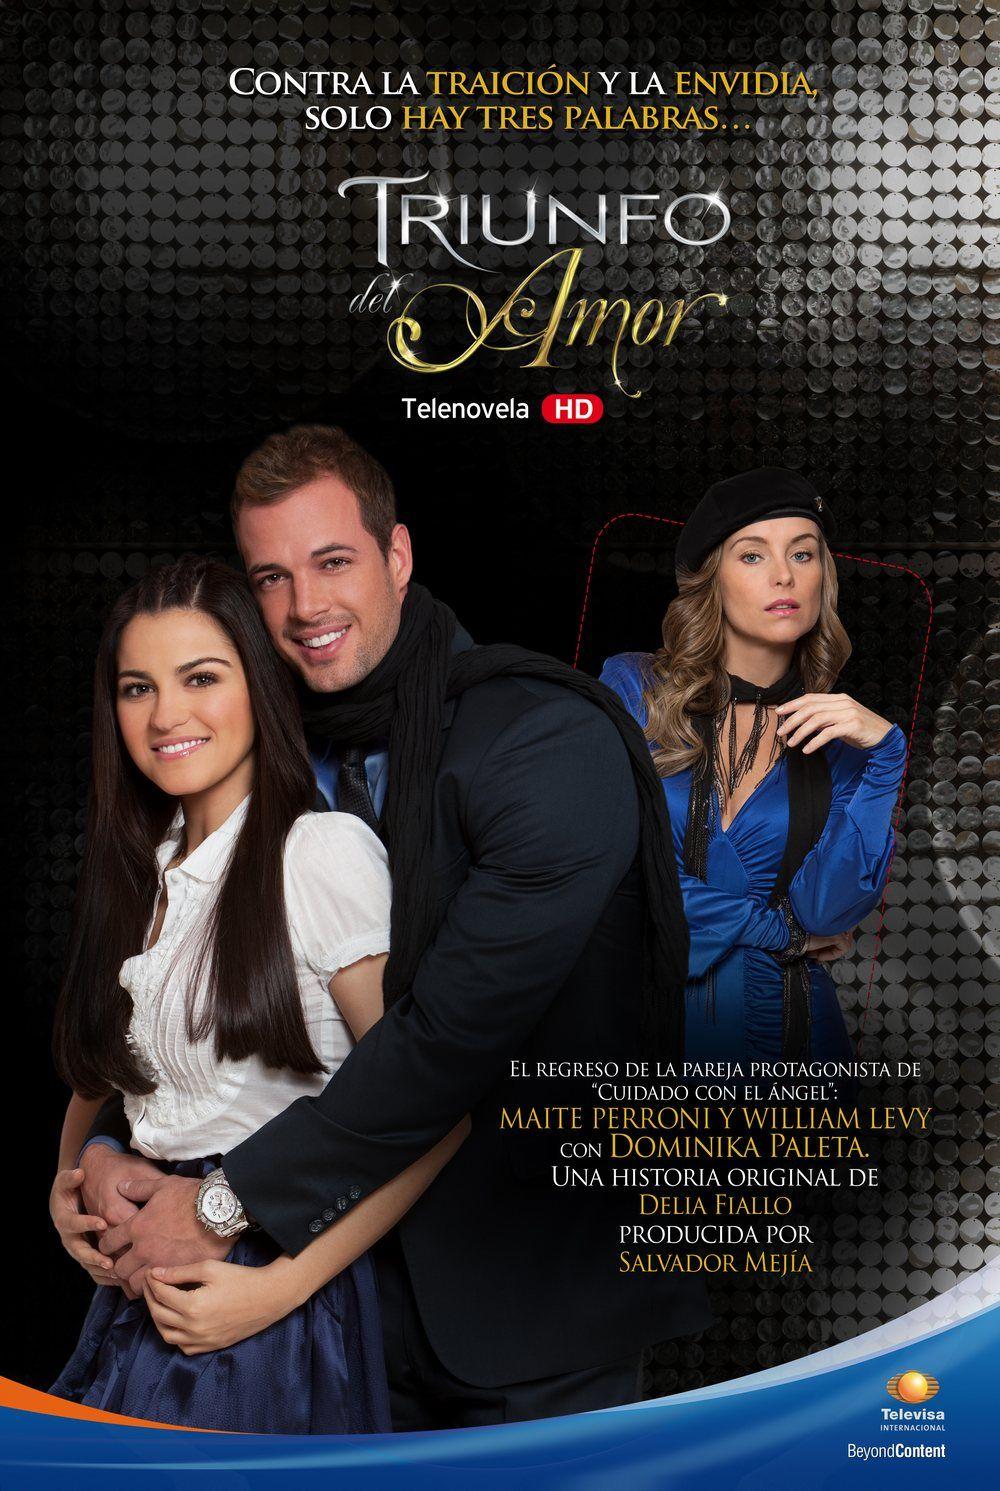 Triunfo Del Amor Tv Direct Telenovelas Spanish Movies